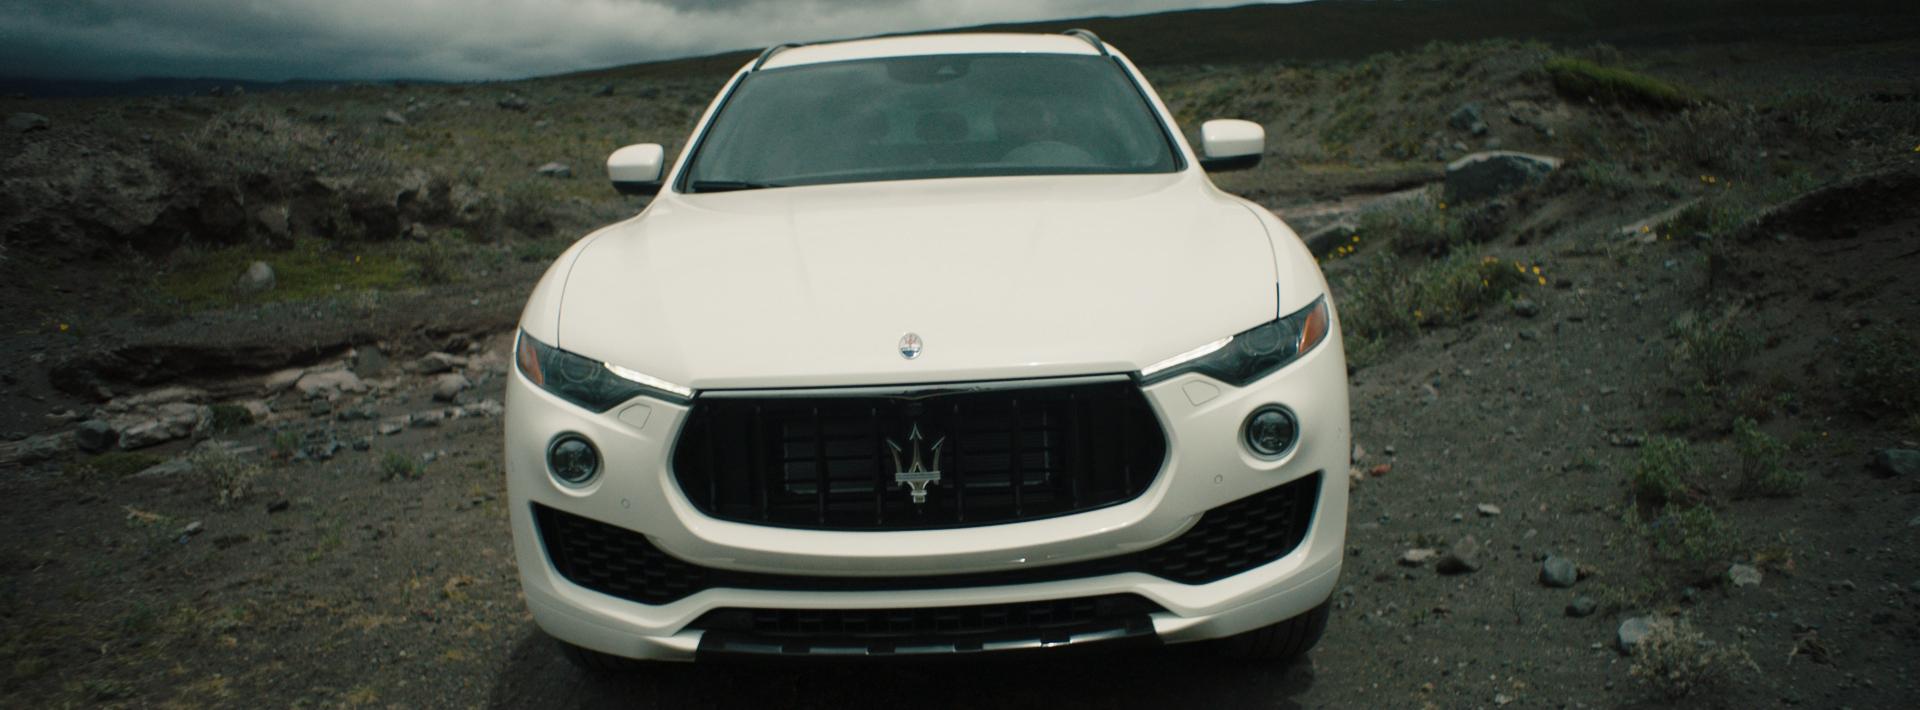 Maserati_1.128.1 copy.jpg